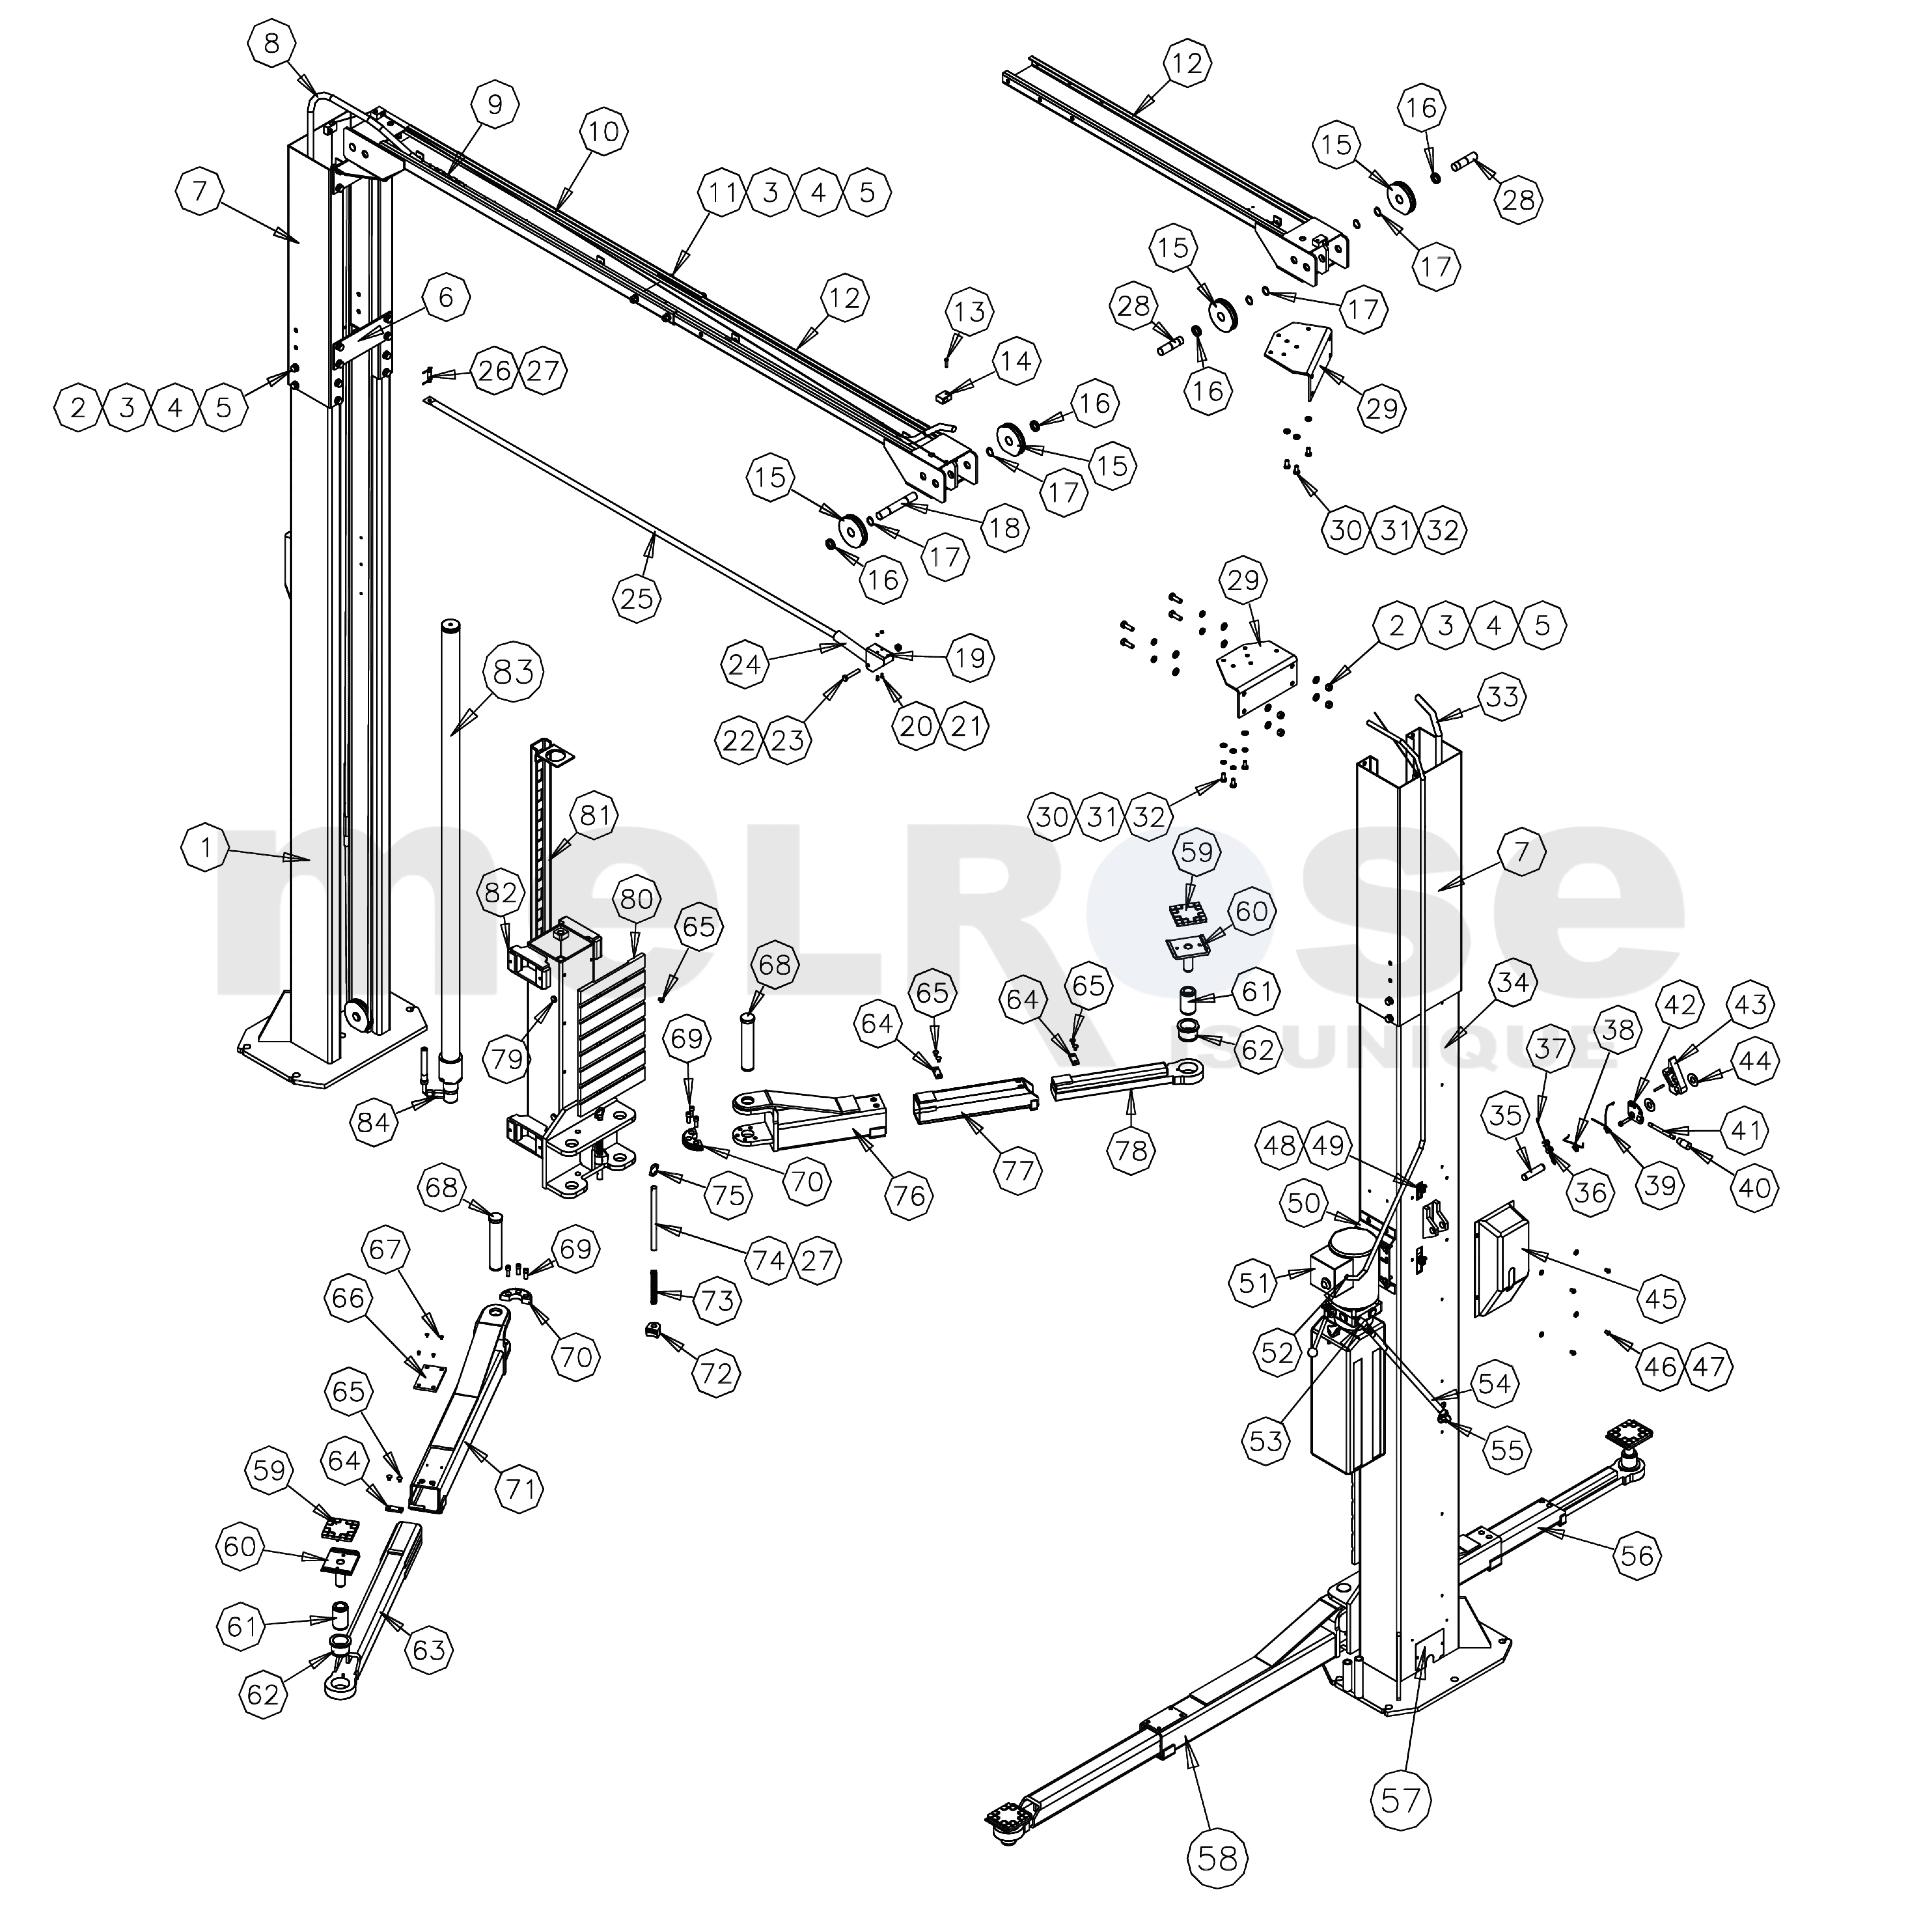 vs10-parts-diagram-marked.jpg